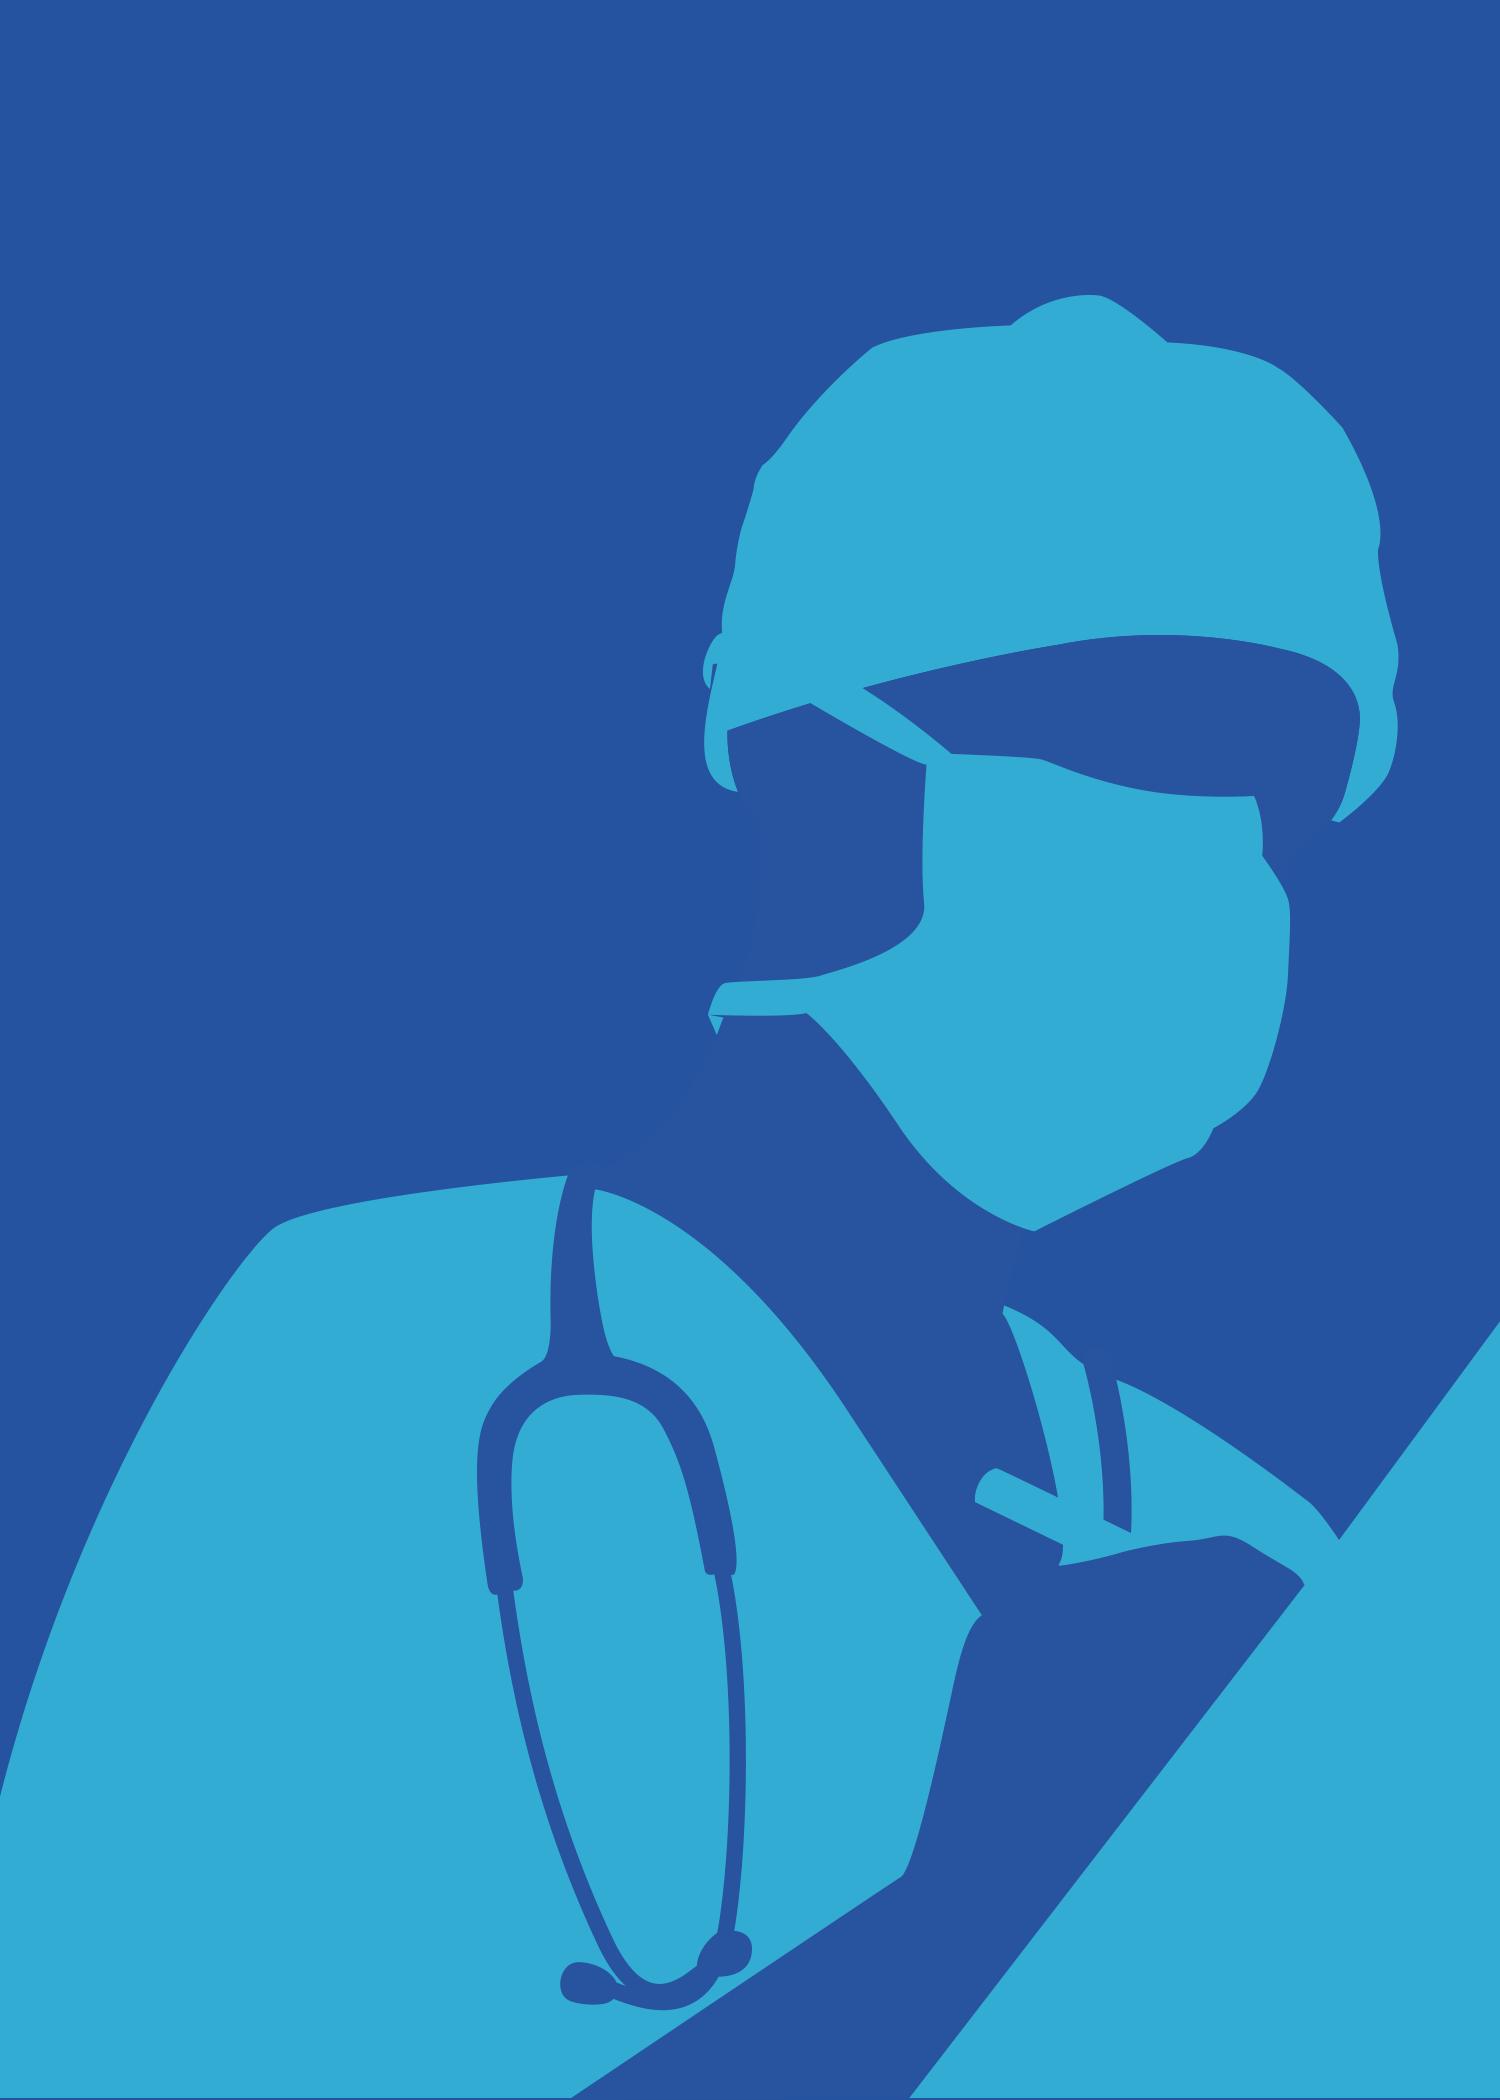 Campaign for Nurse association in Finlan